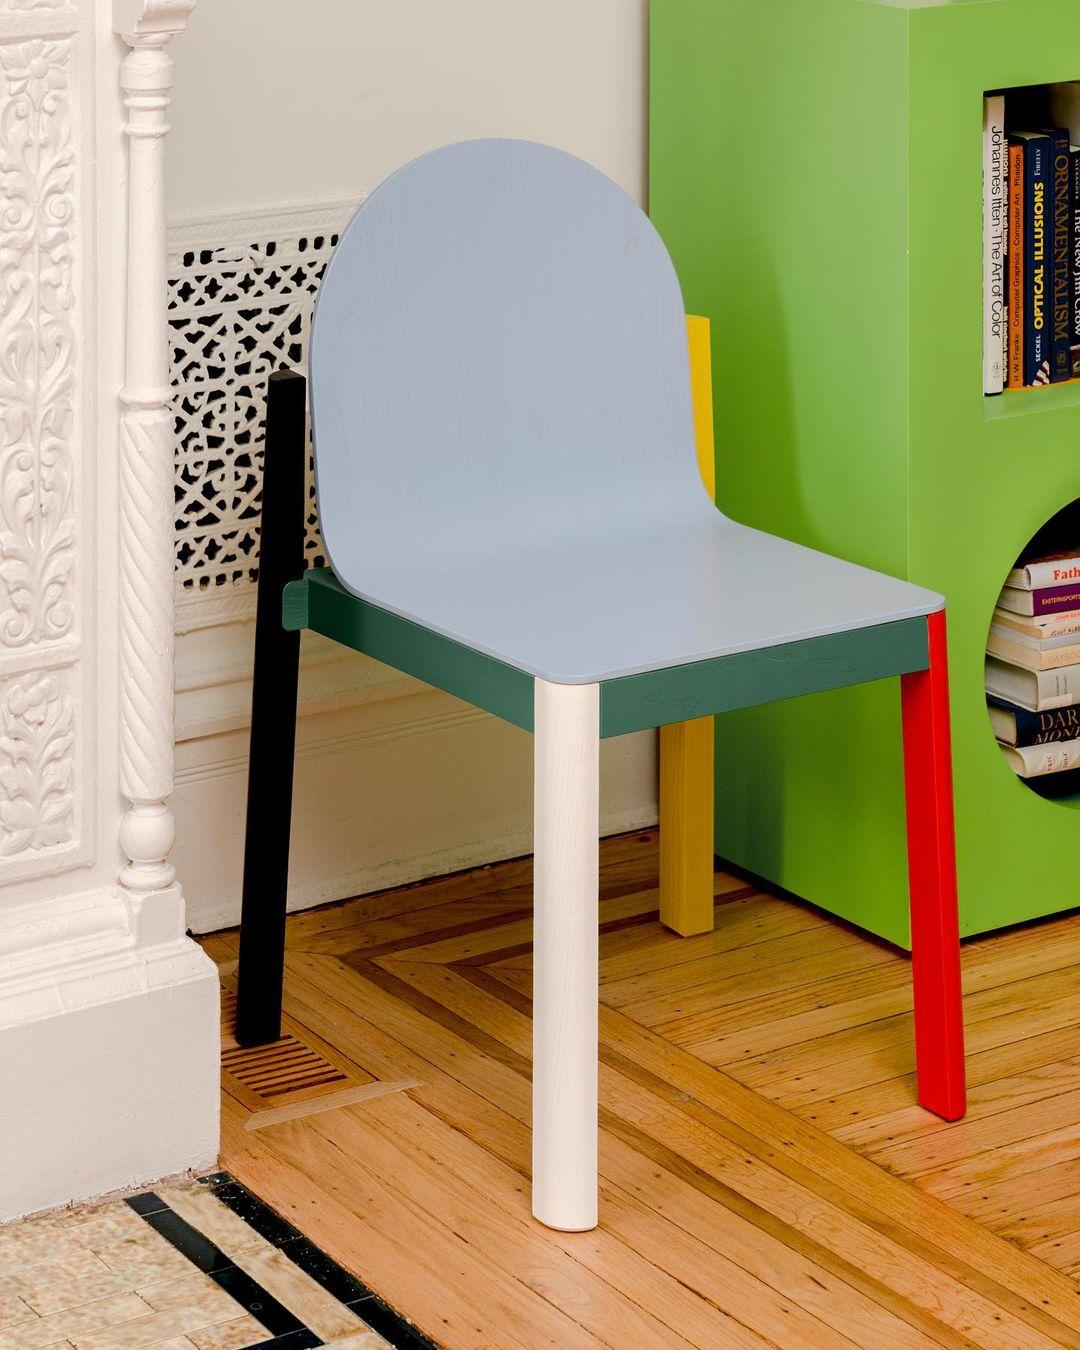 Stine Aas + DusenDusen + Dims Collaborative Cleo Chair